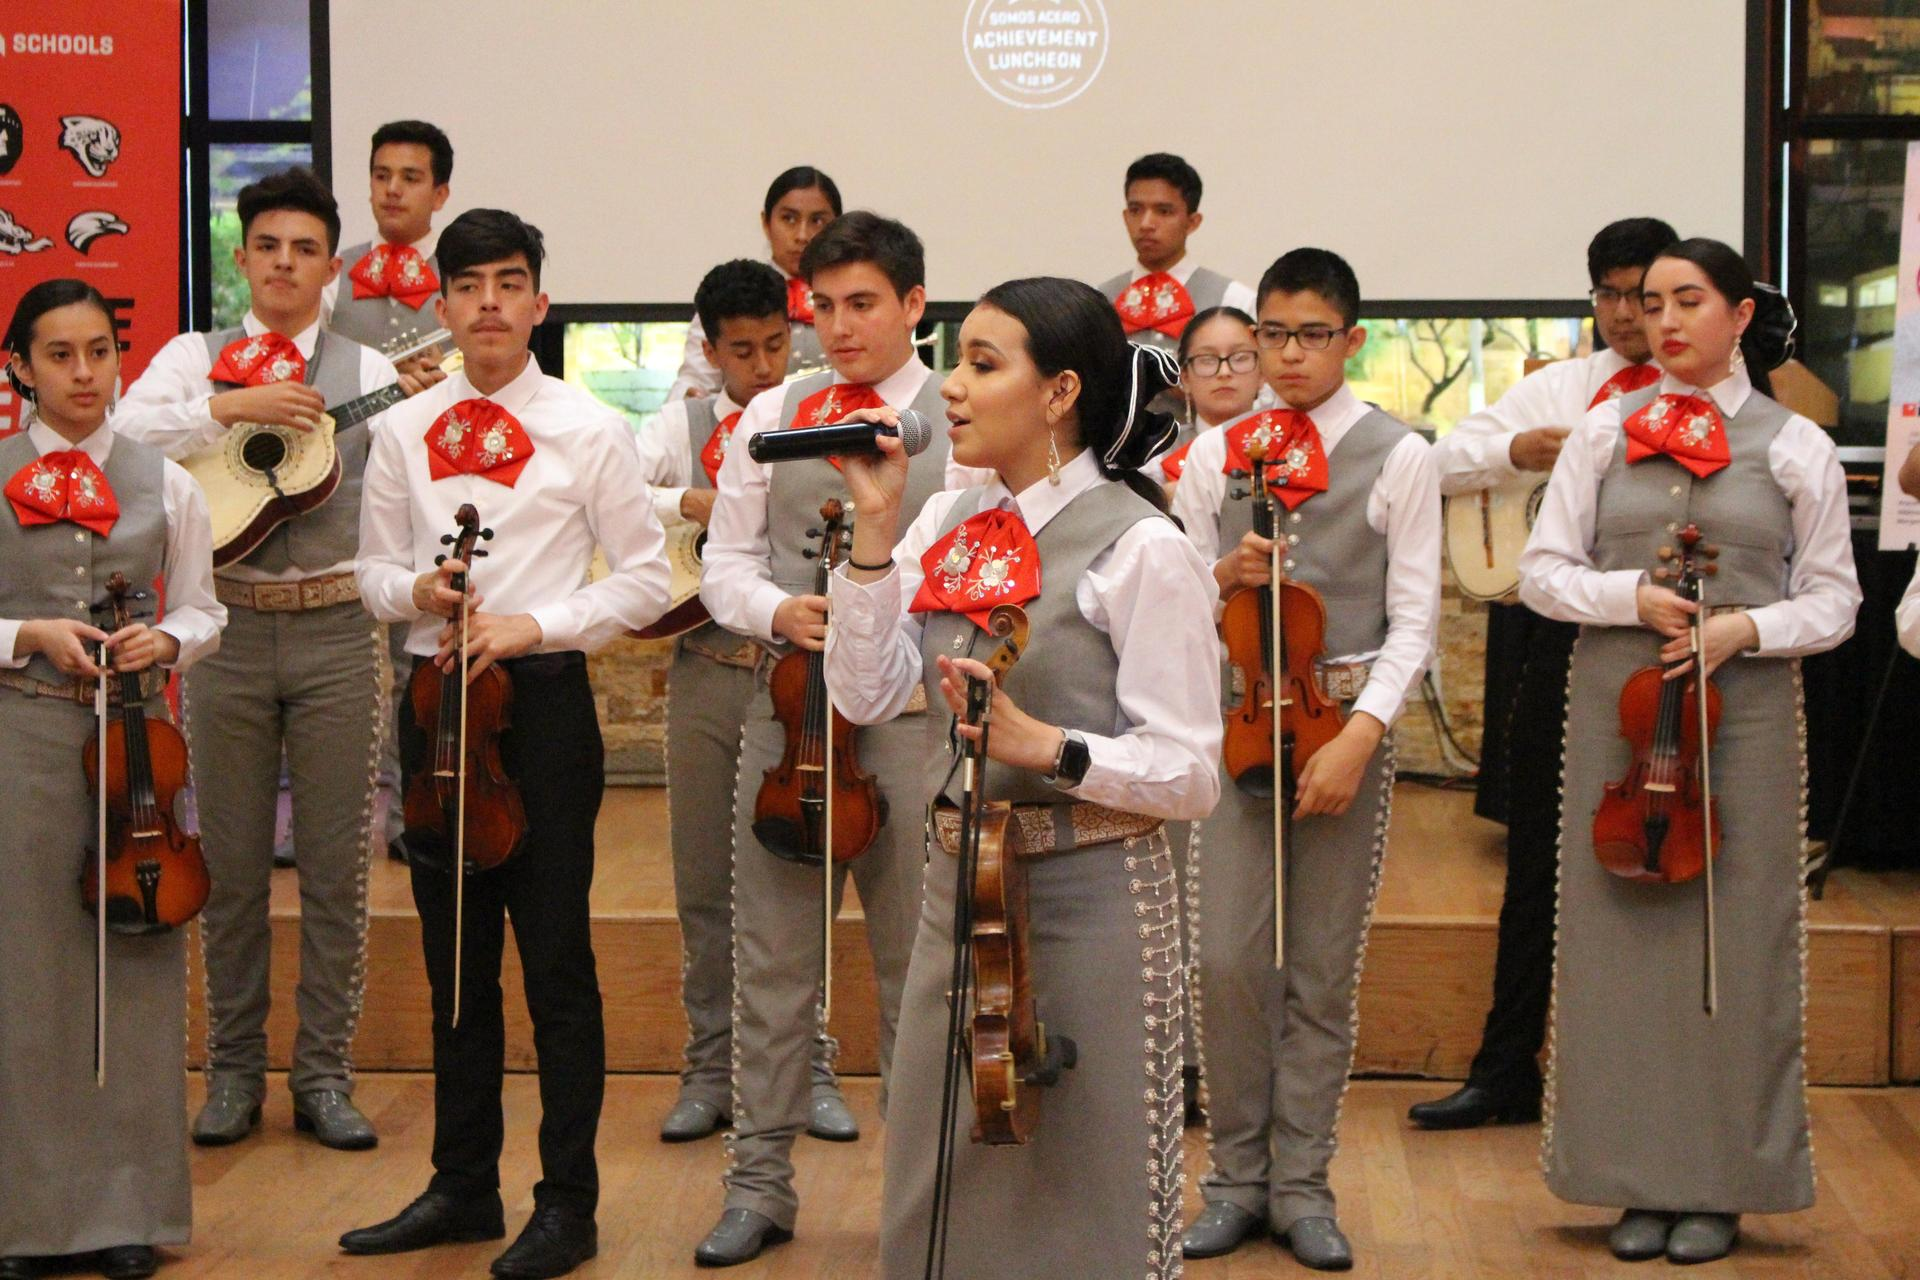 mariachi group